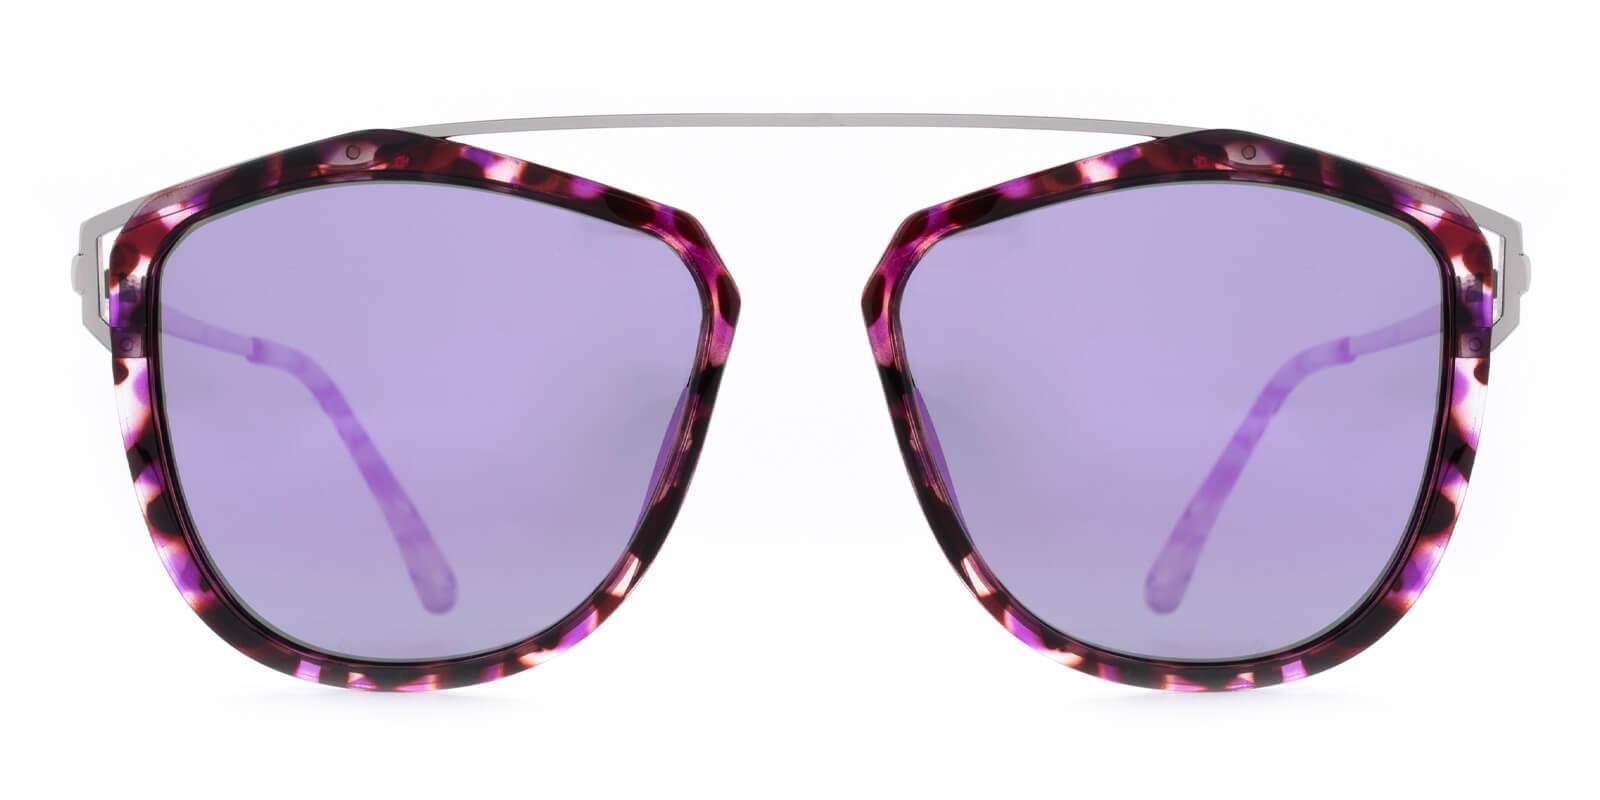 Phantom-Purple-Aviator-Combination / Metal / TR-Sunglasses-additional2